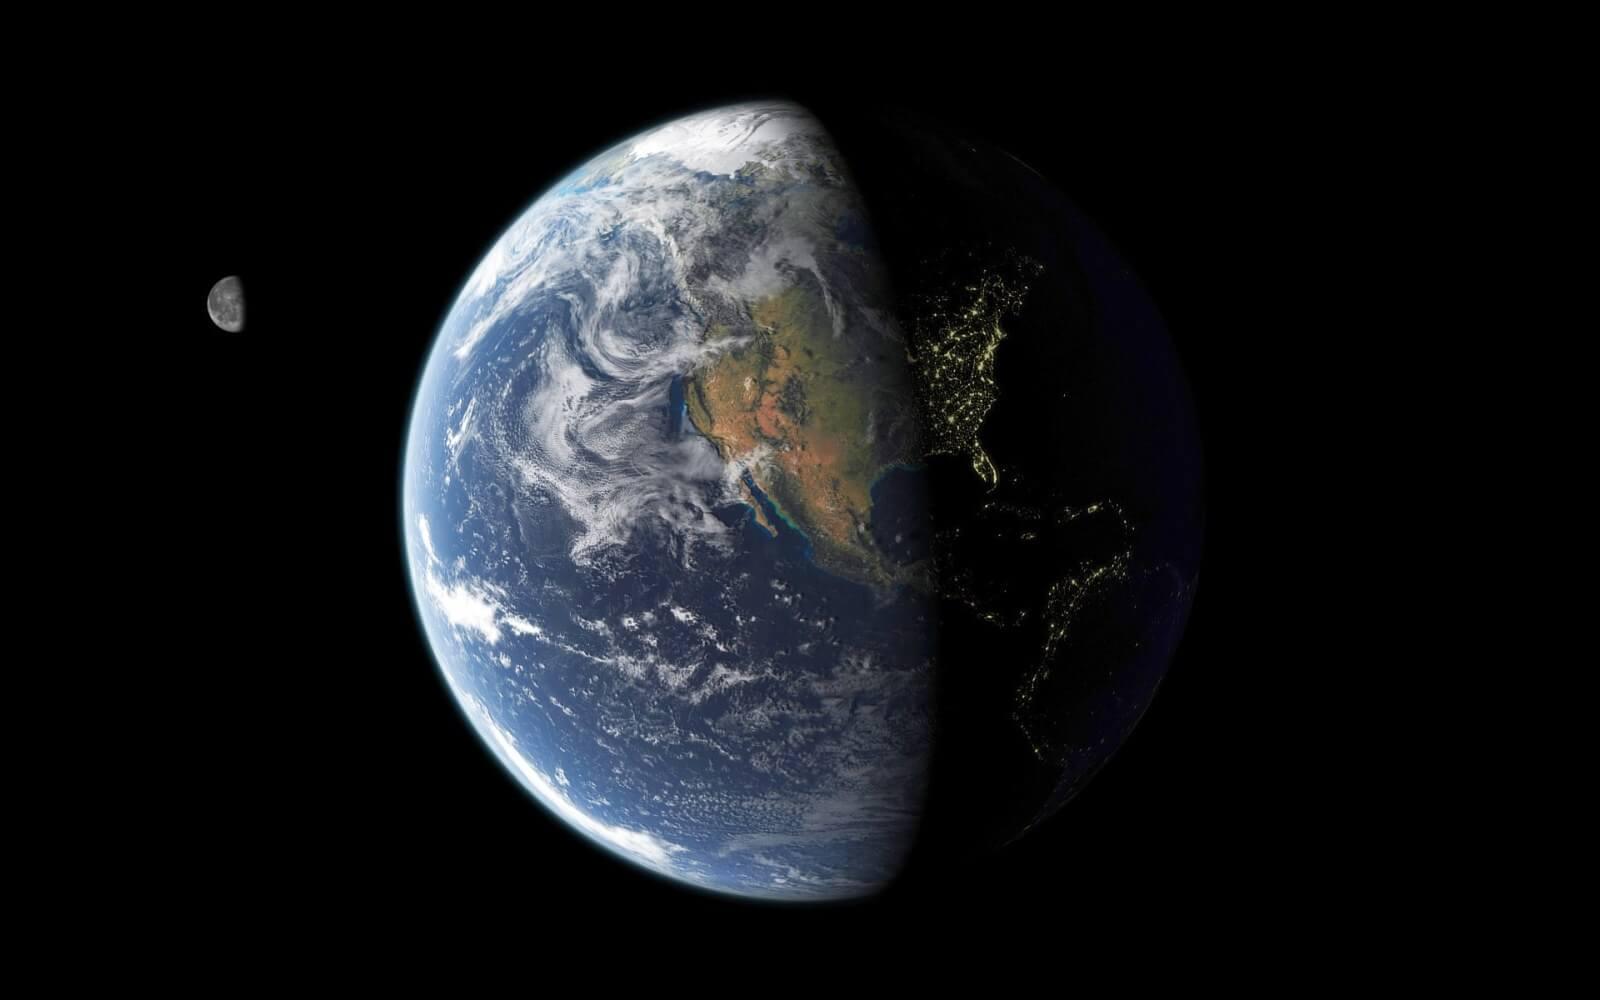 earth night desktop space wallpapers seasons science iweathernet wallpapersafari code